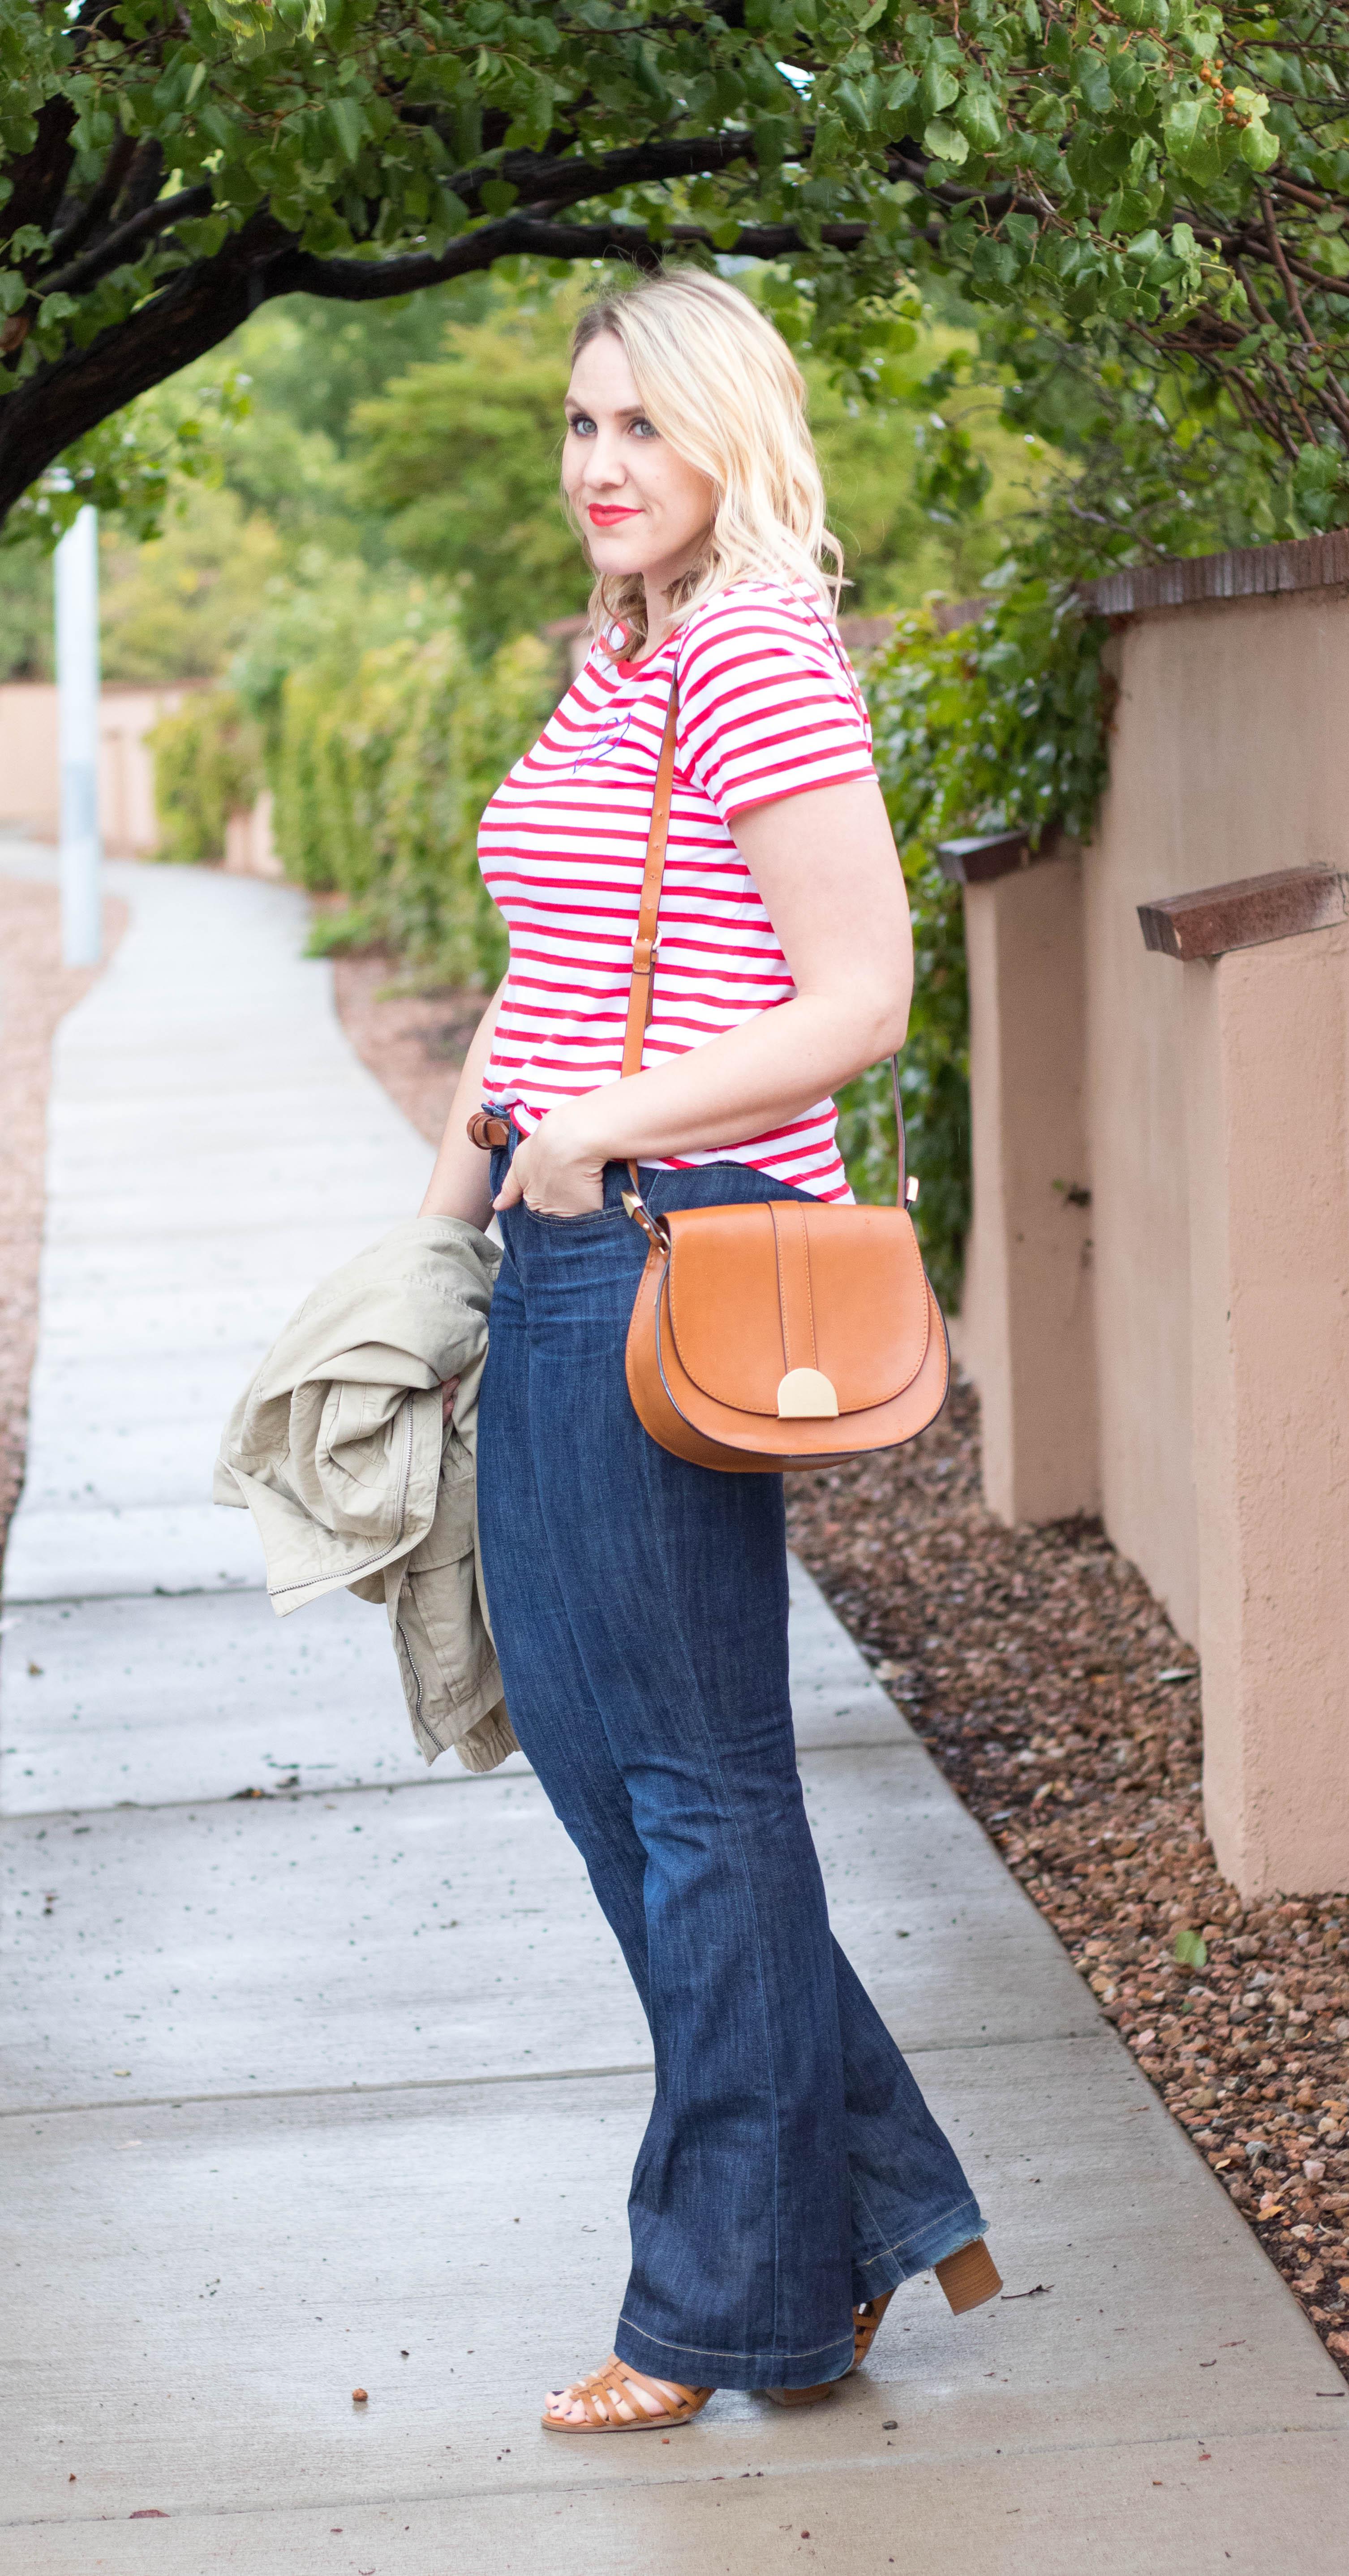 how to style flare jeans #gap #meetmeinthegap #fallfashion #fashionblogger